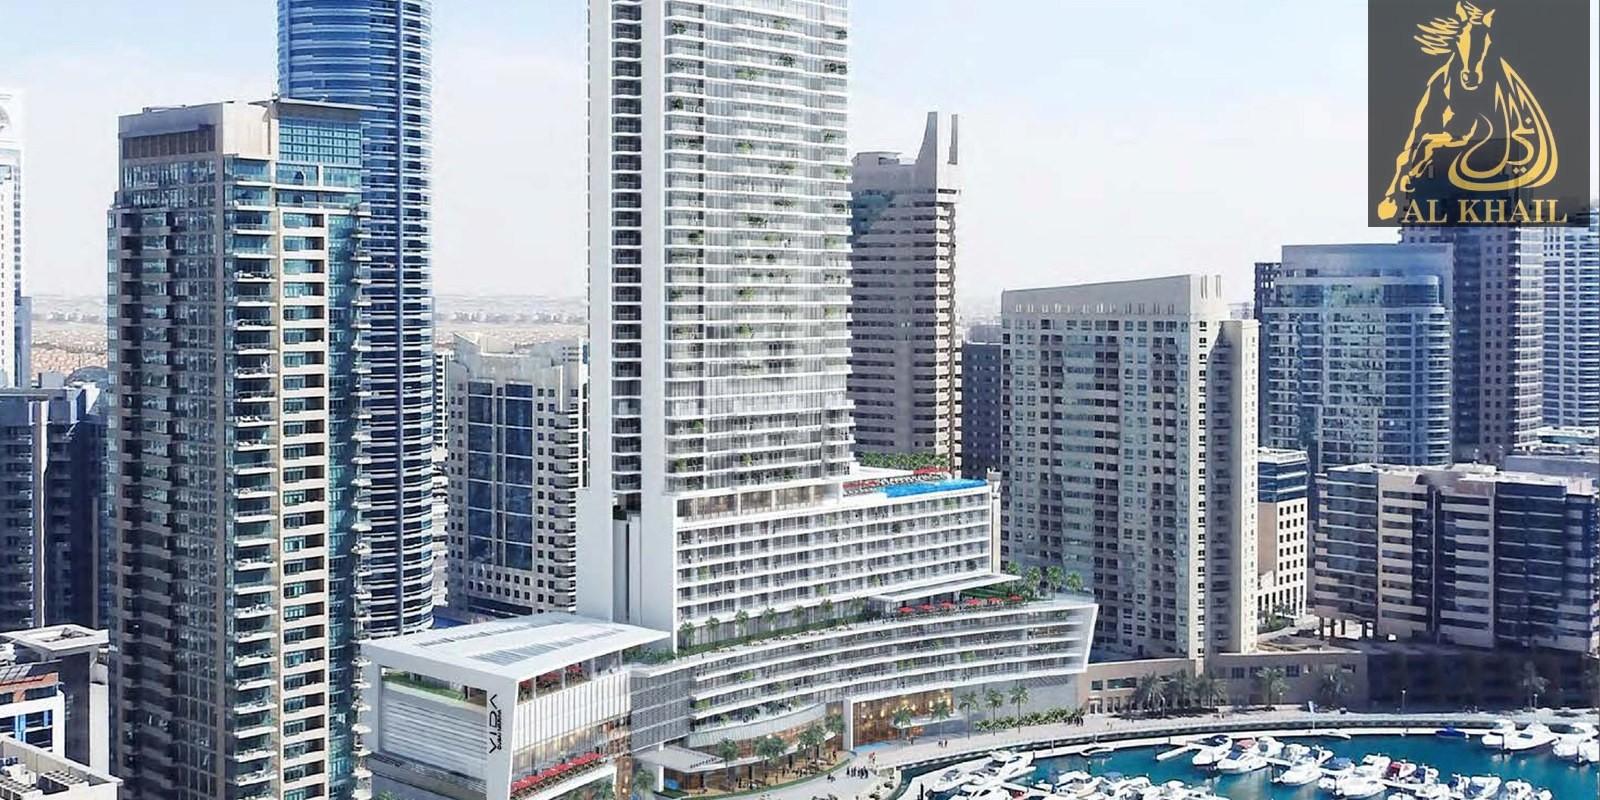 Spacious Grandeur 2BR in Dubai Marina Scenic Marina Views 3 Yrs Post Handover